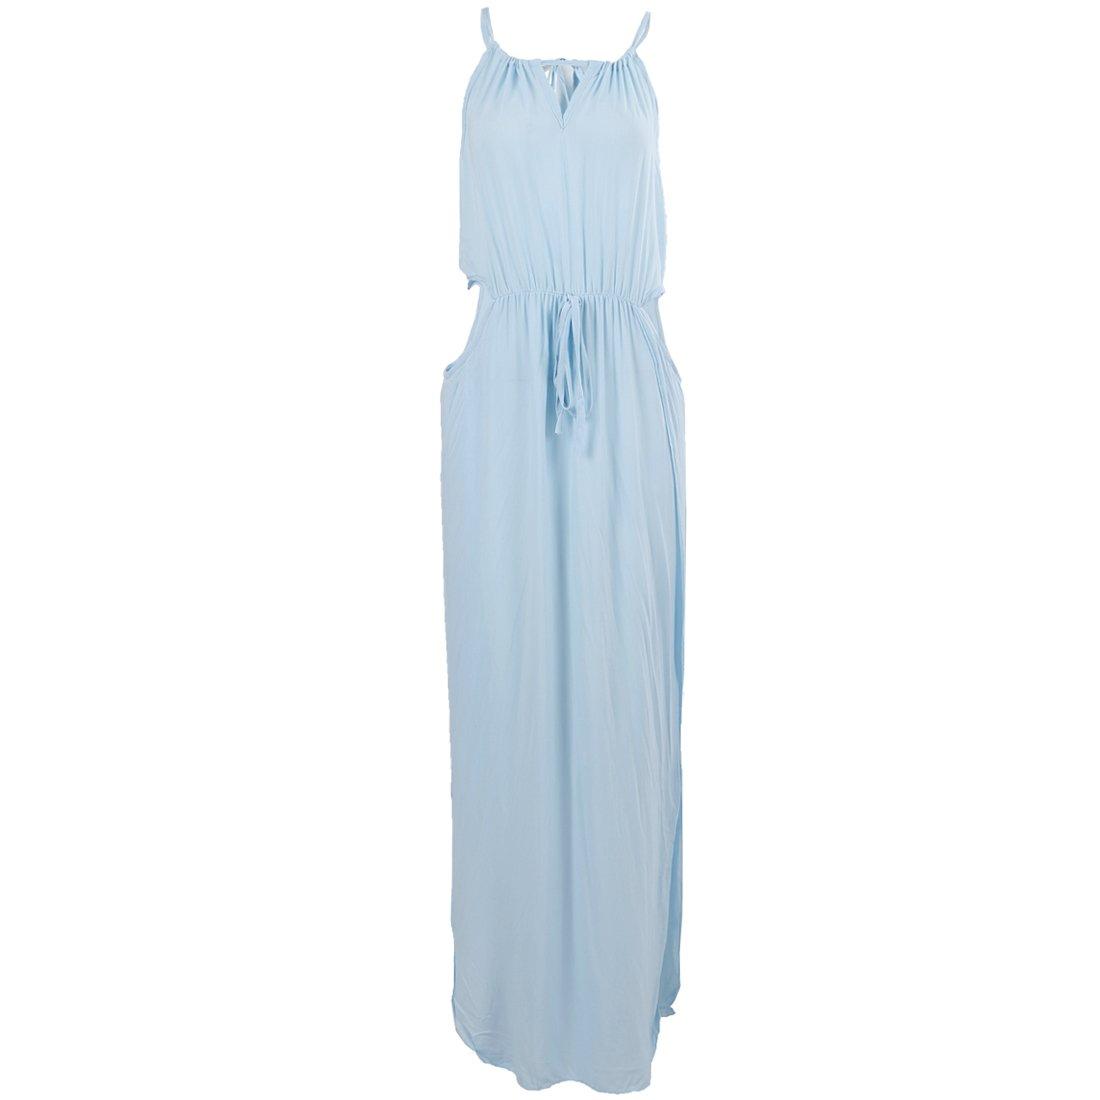 SODIAL(R) Summer Women Fashion Sexy Long Beach Dresses Light Blue M